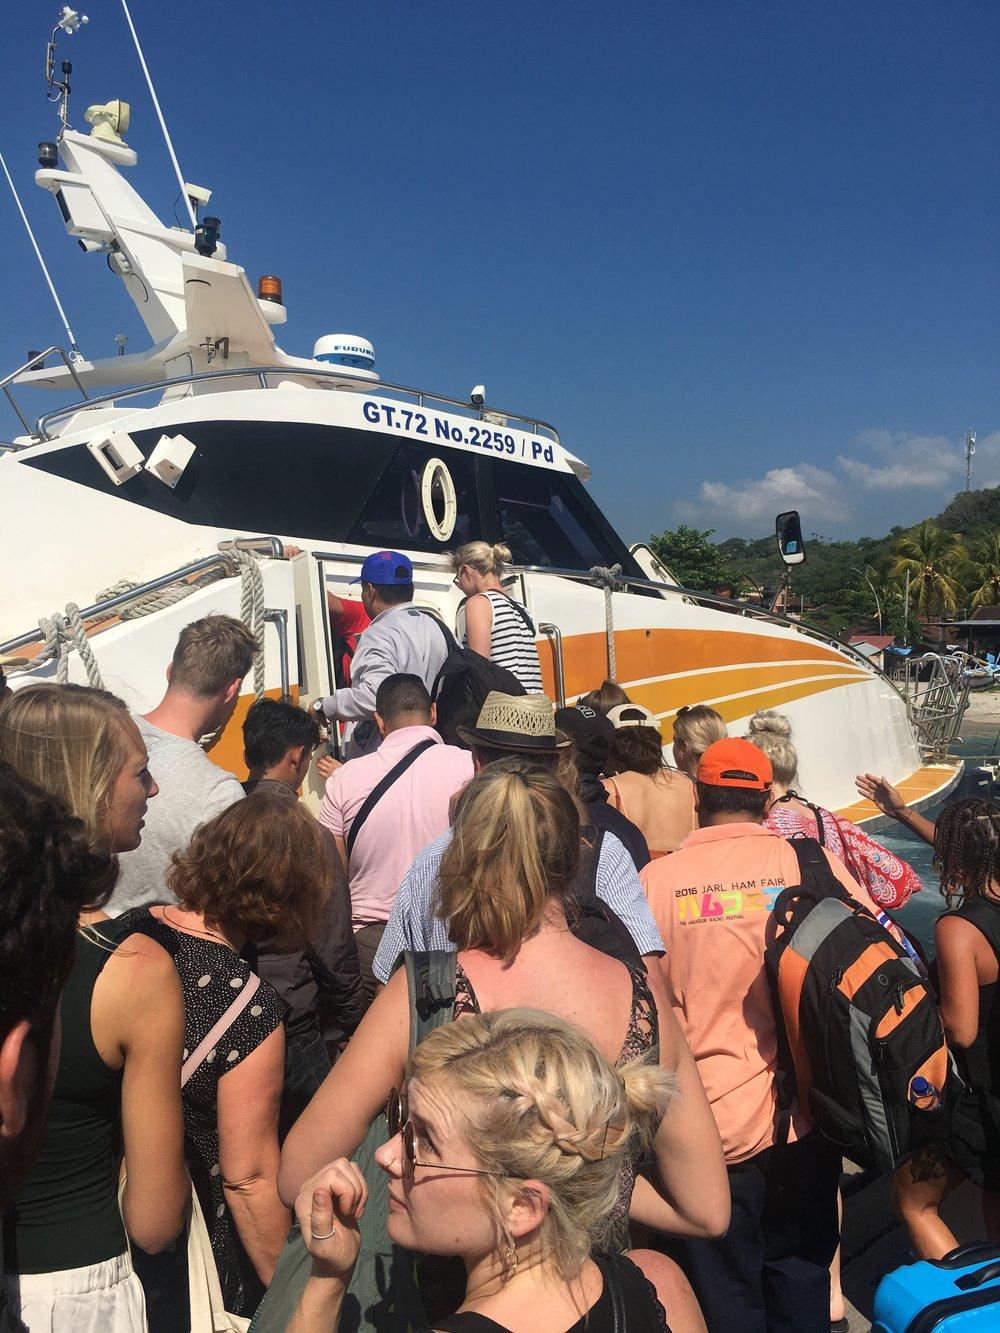 Boarding the boat on Bali